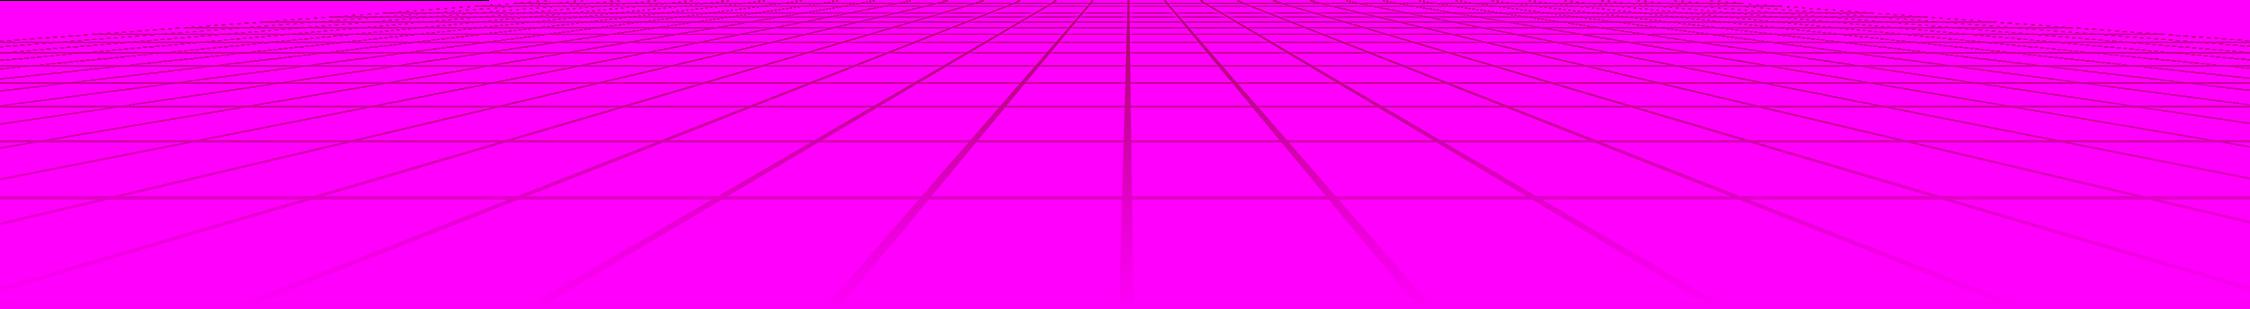 Illustration of a big grid